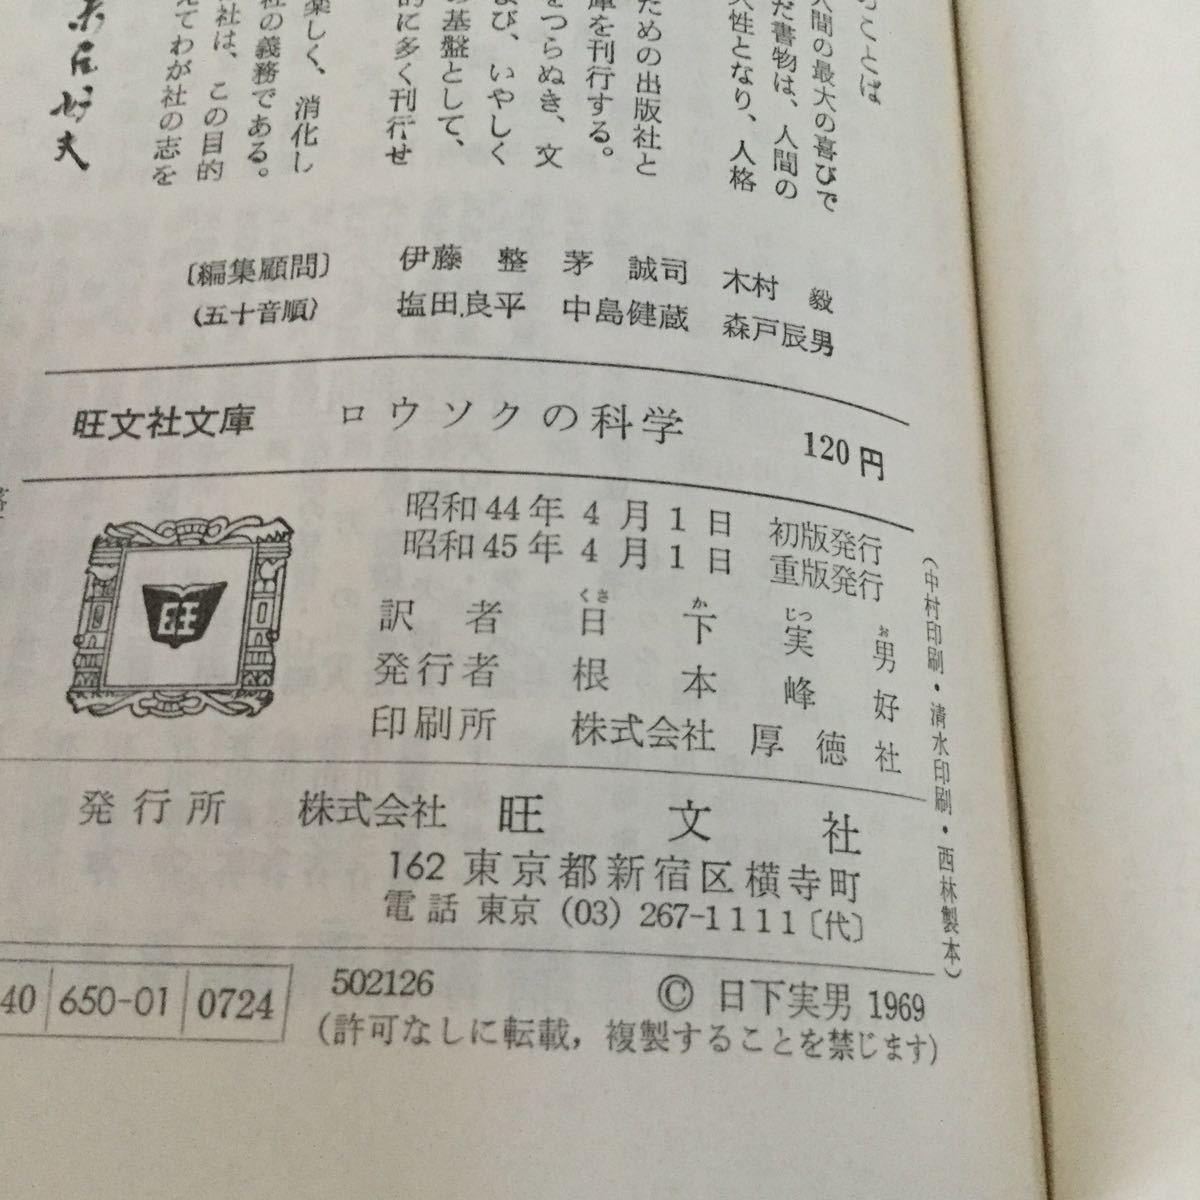 a37 ロウソクの科学 ファラデー 日下実男 小説 旺文社文庫 旺文社 _画像10